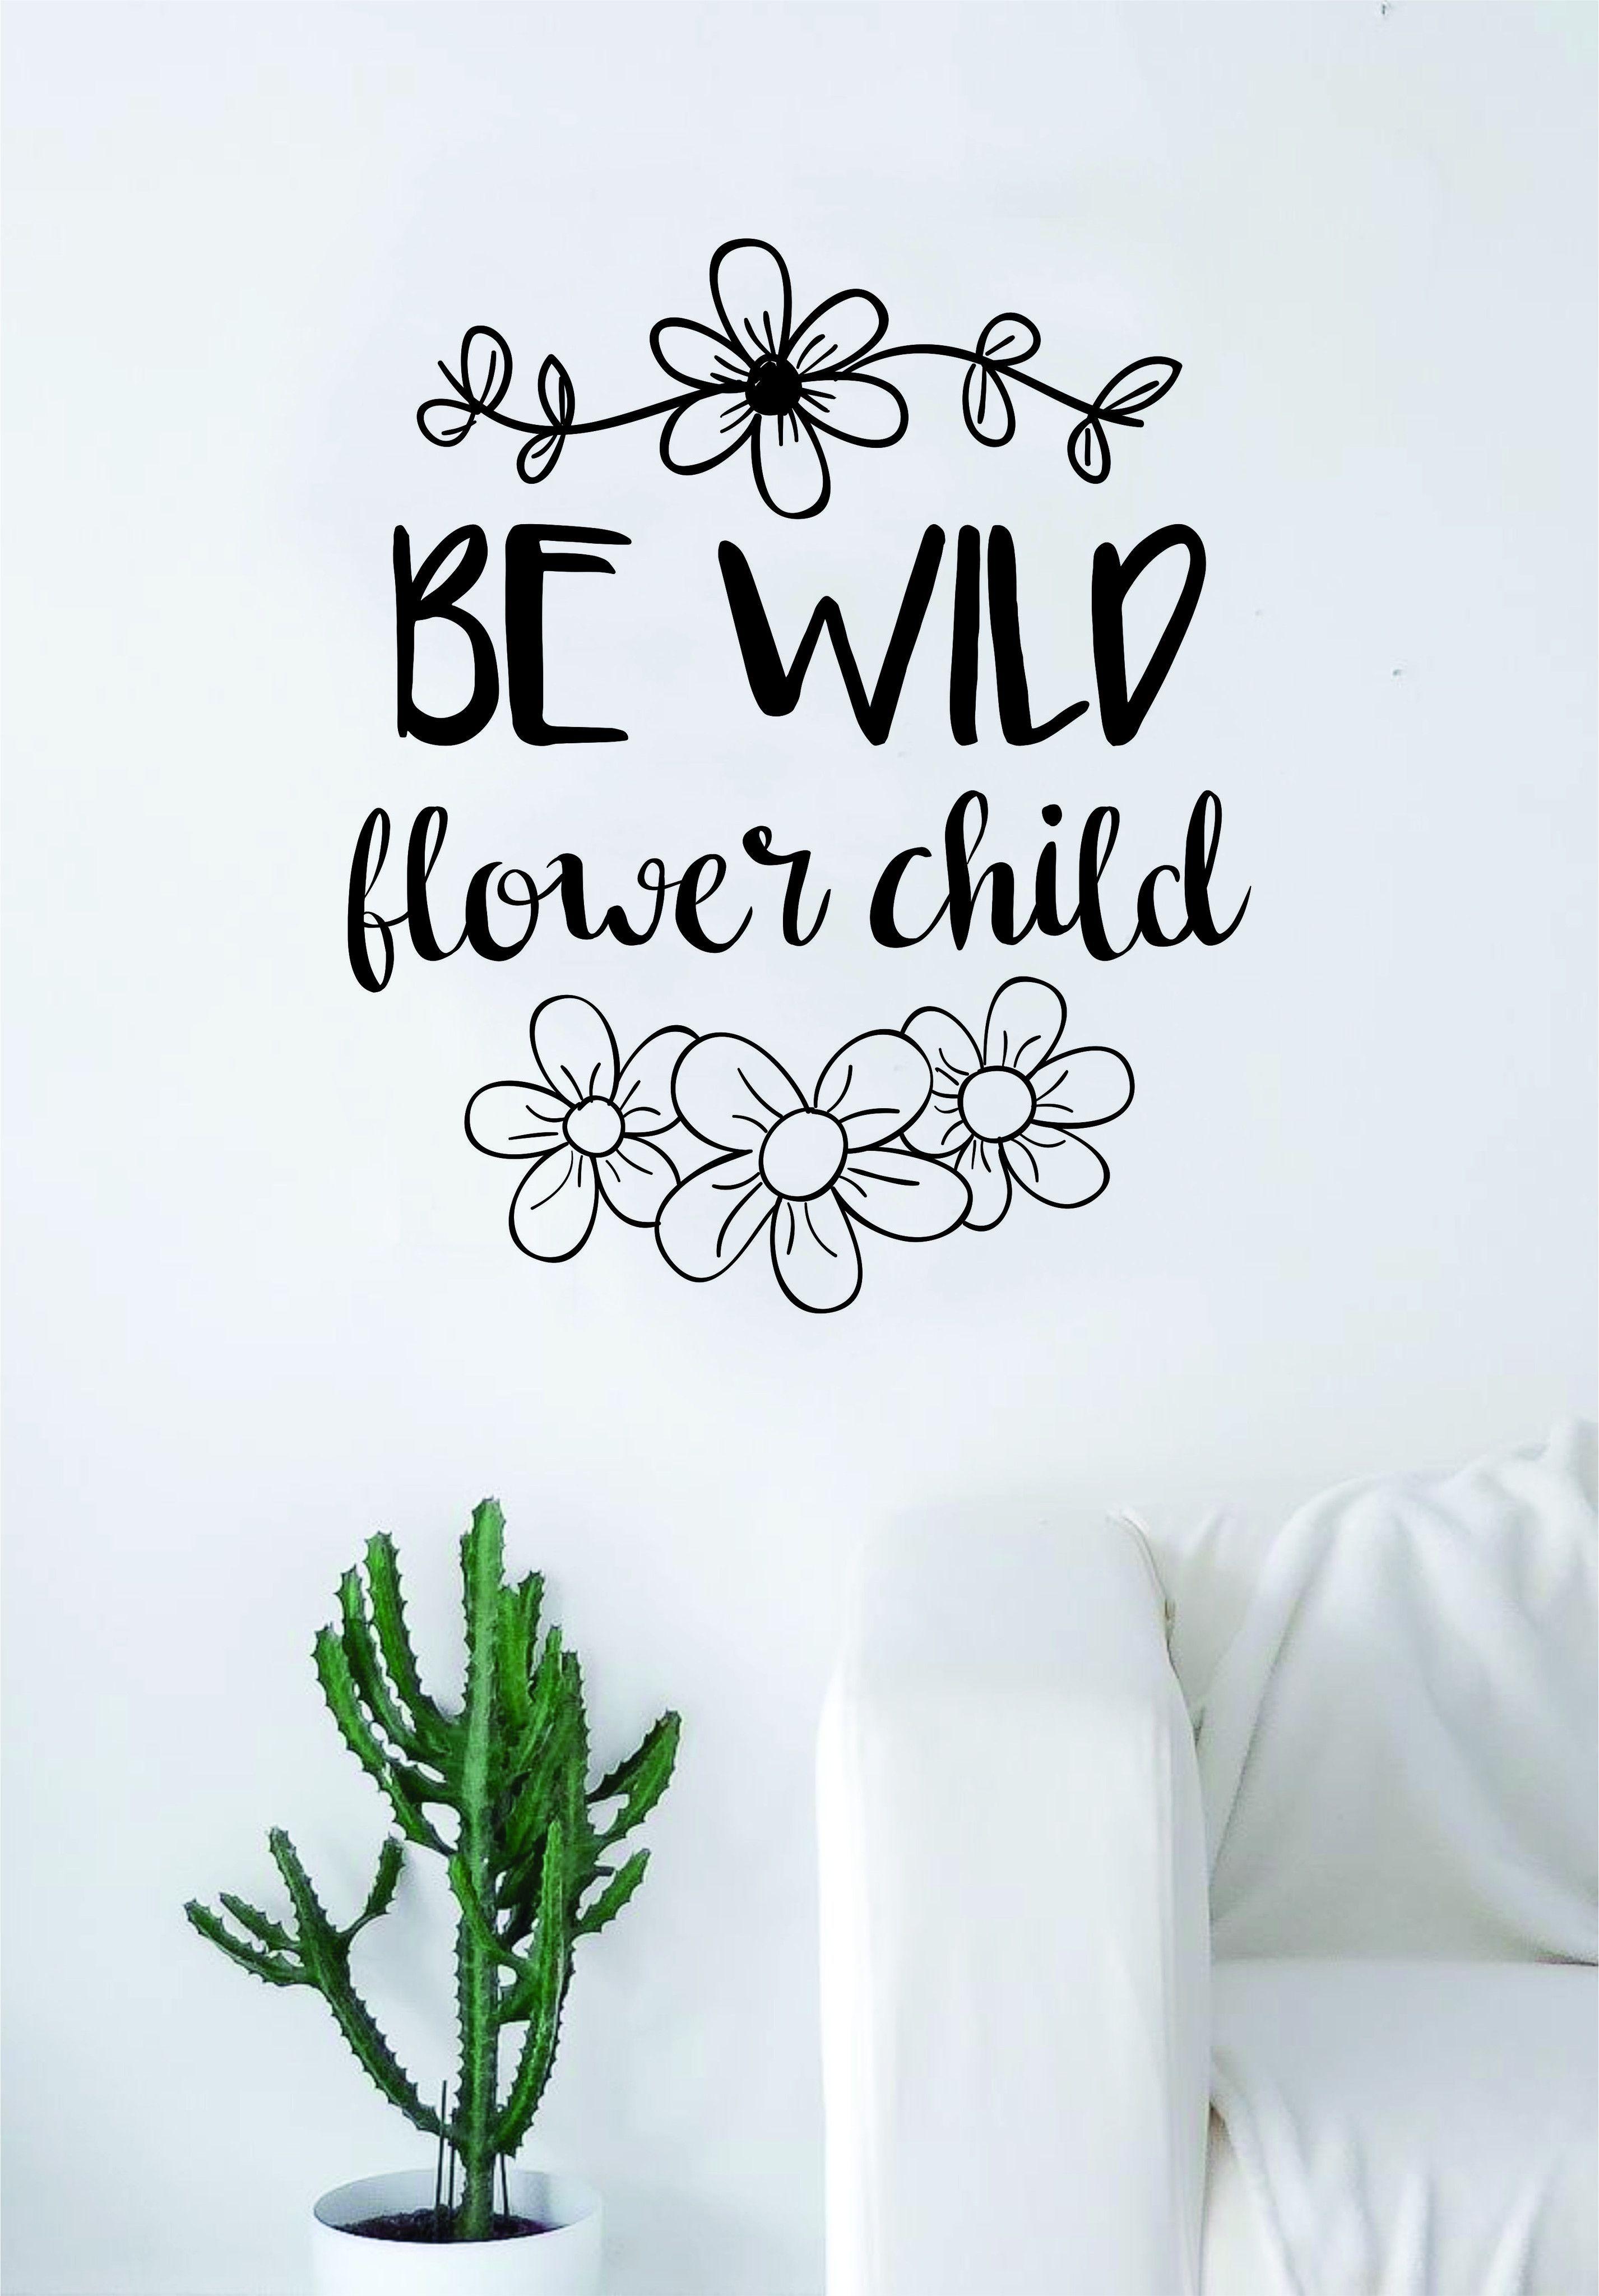 be wild flower child quote wall decal sticker room art vinyl be wild flower child quote wall decal sticker room art vinyl beautiful nature cute nursery tattoo